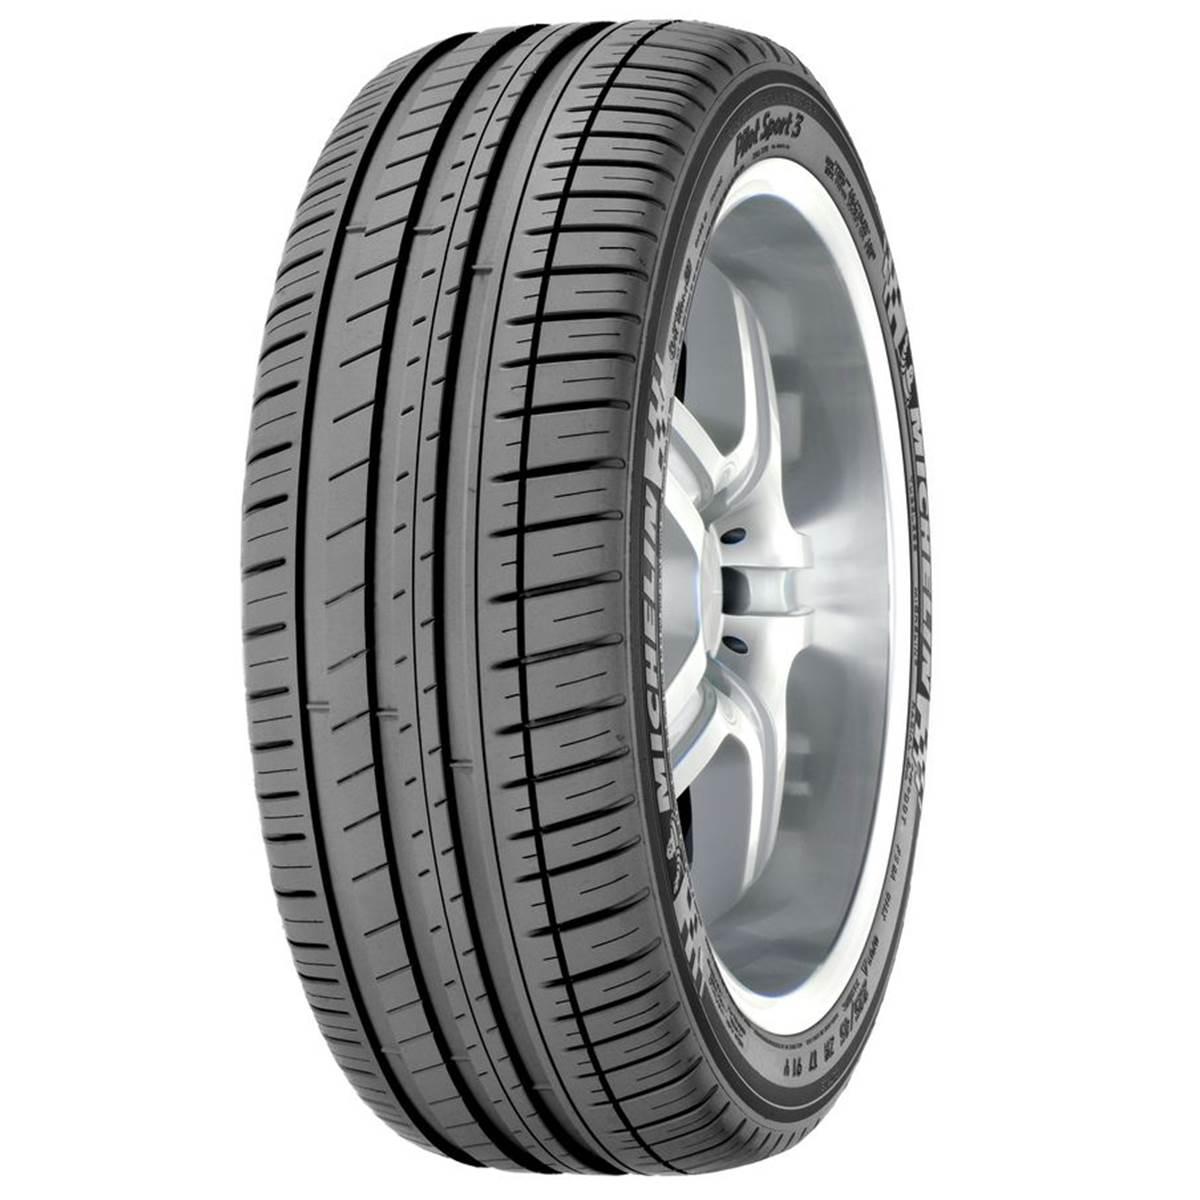 Michelin Pilot Sport 3 Zp Acoustic Homologue Mercedes Xl